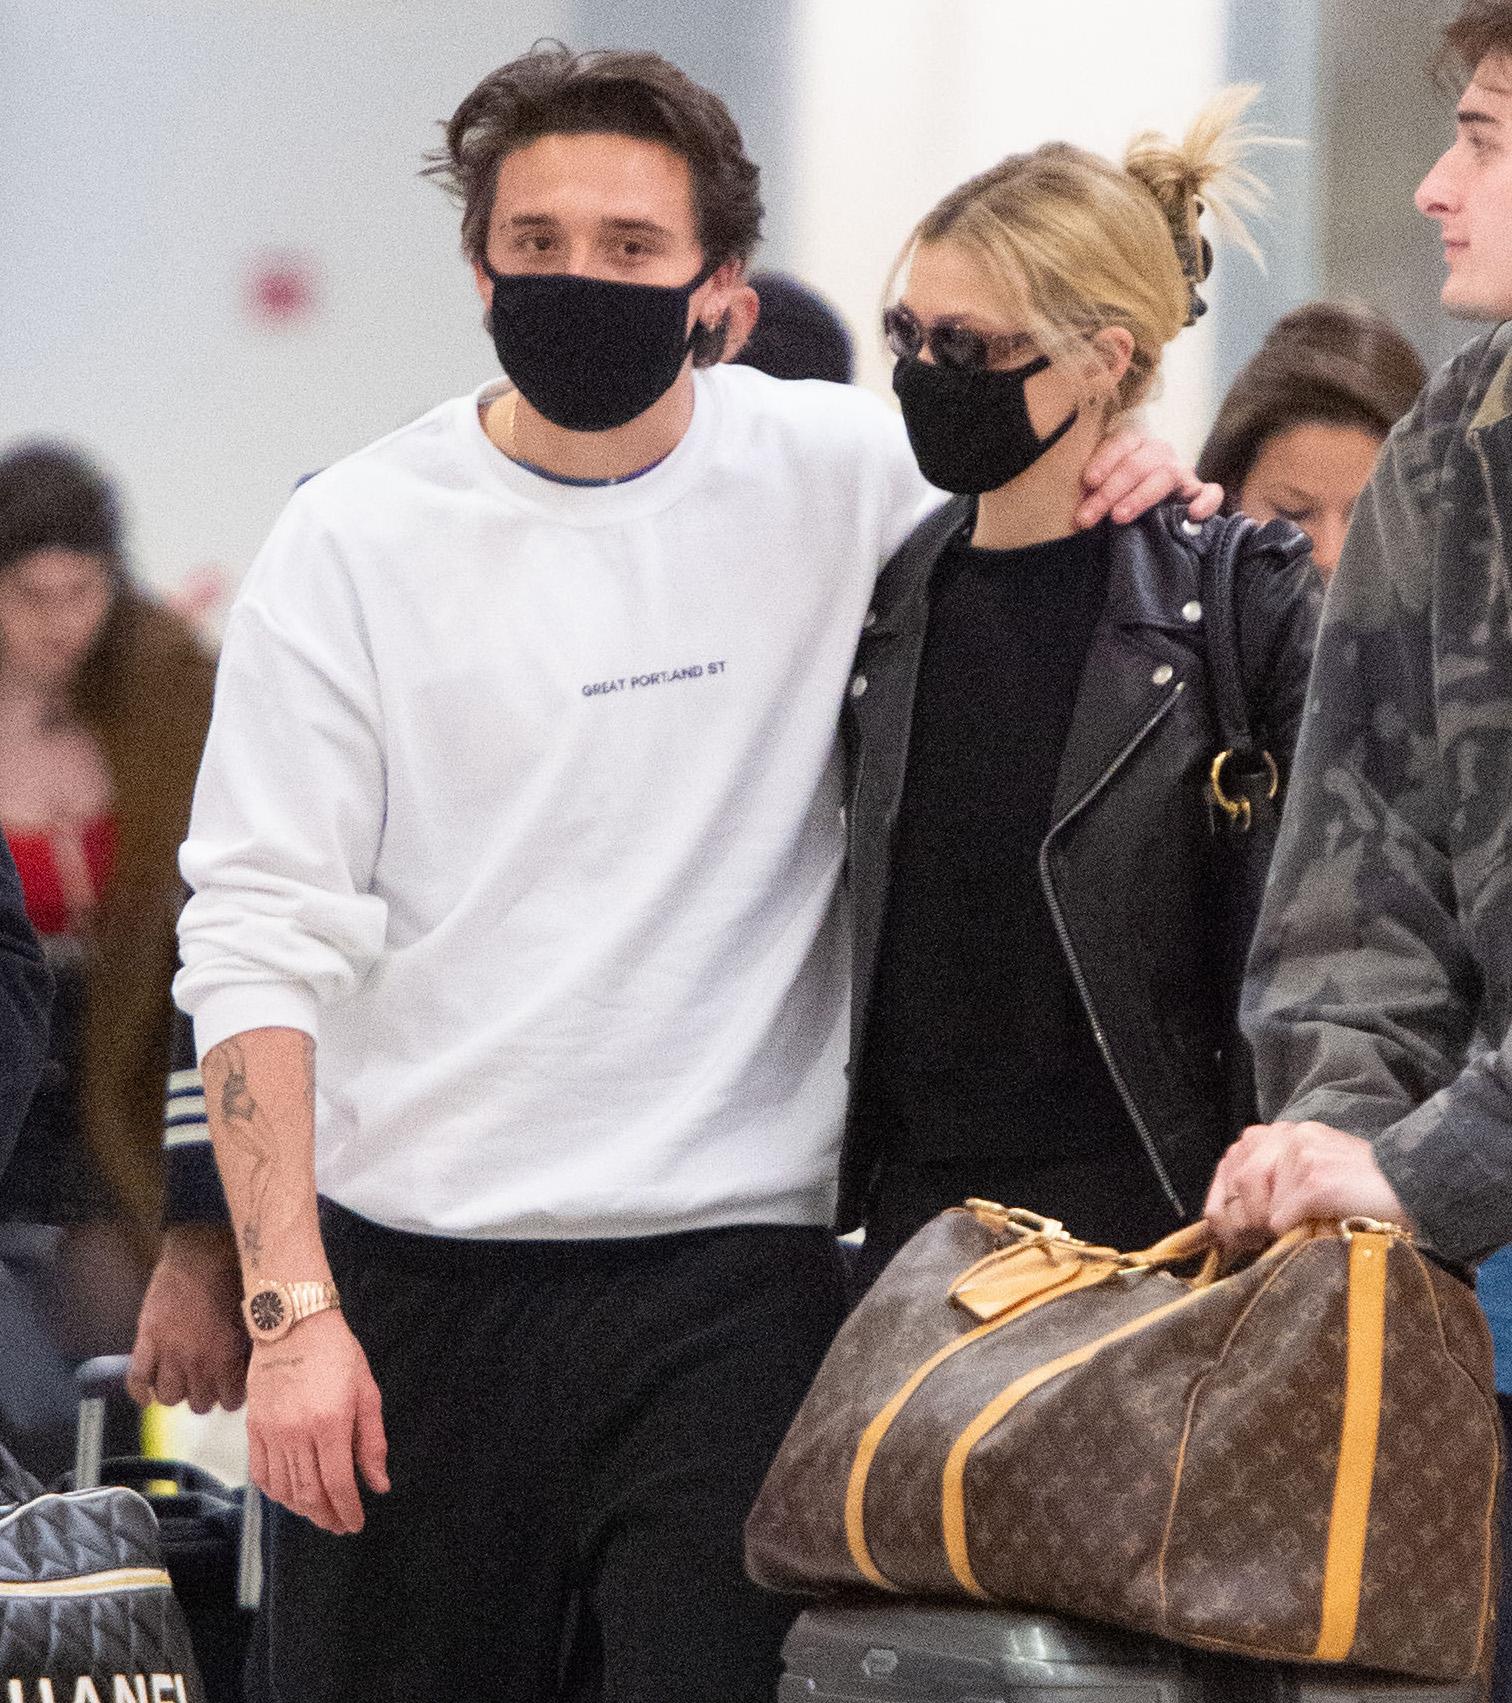 Brooklyn Beckham and girlfriend Nicola Peltz wear matching masks upon arrival at JFK Airport in New York City.